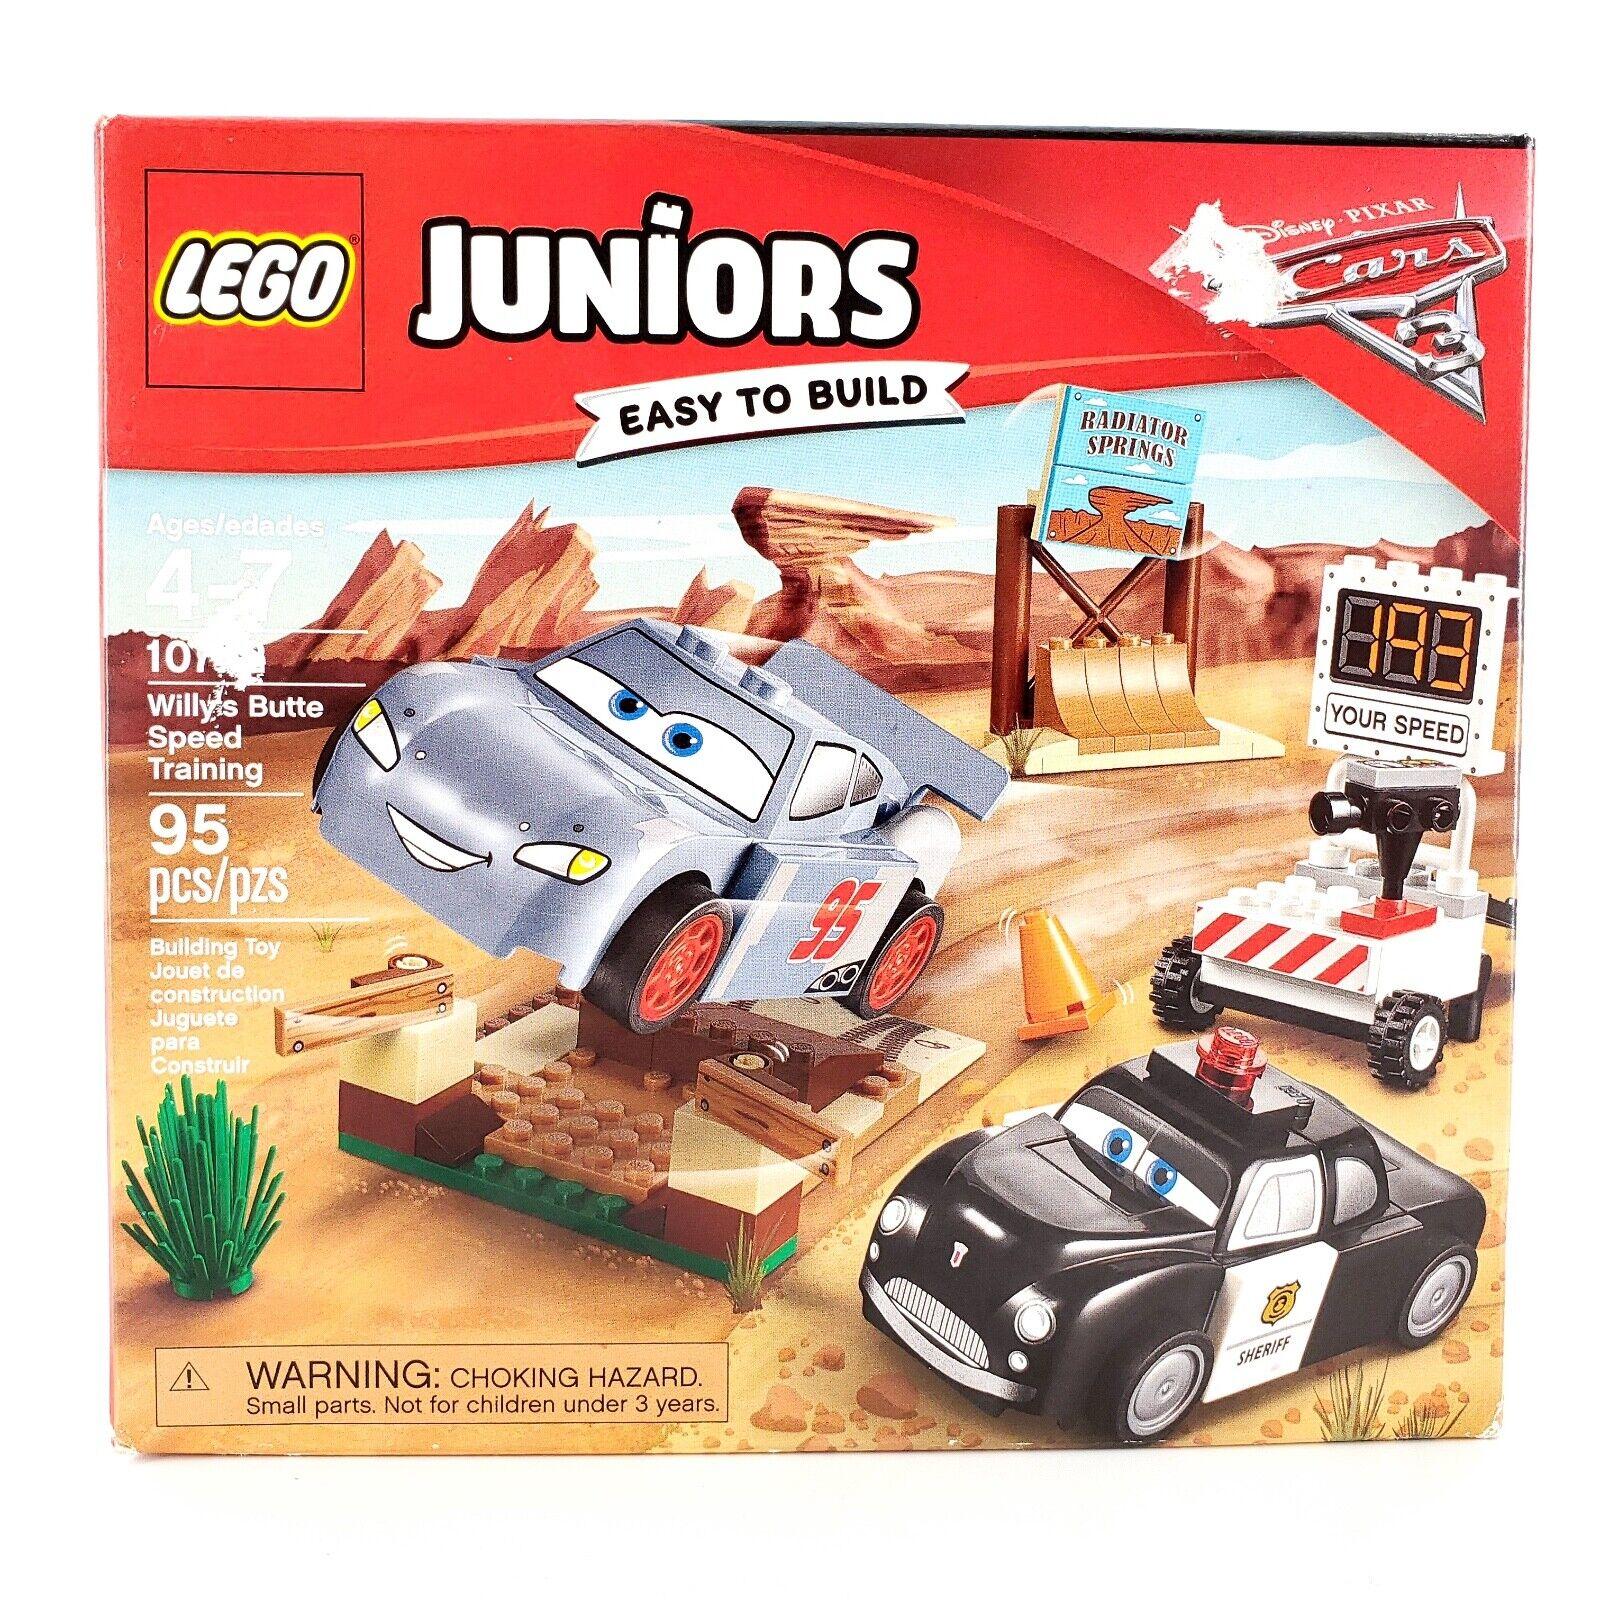 LEGO Juniors 10742 Disney Pixar Cars 3 Willy's Butte Speed